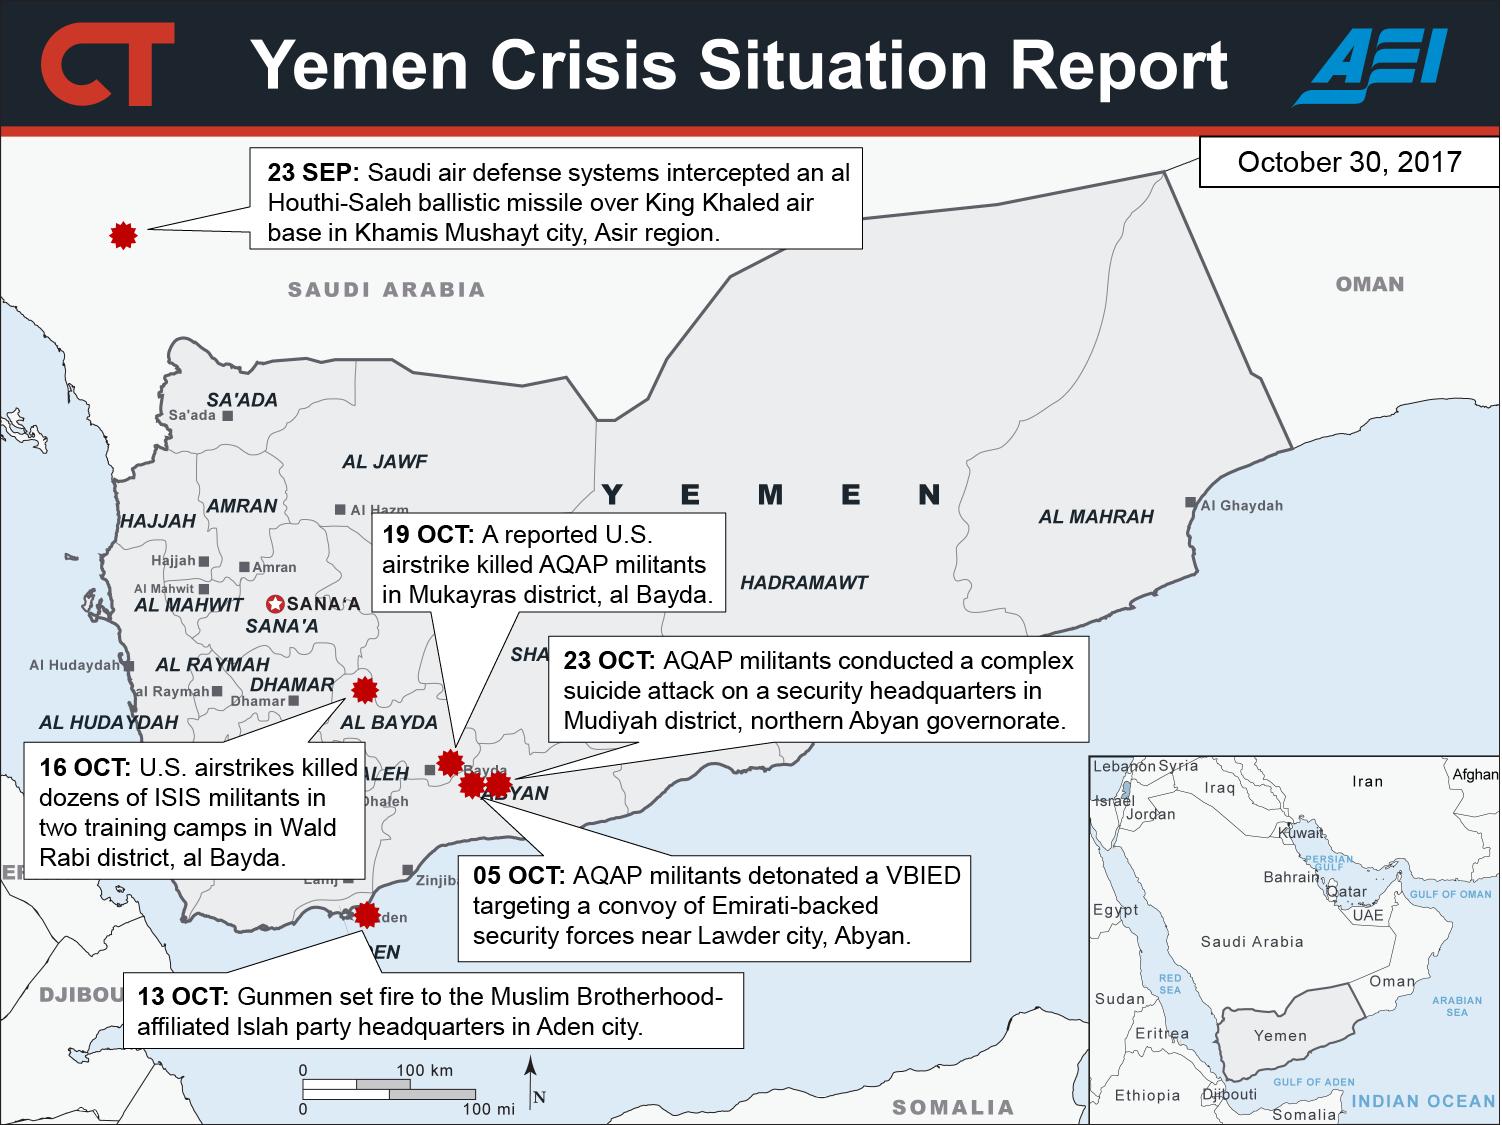 2017 10 30 yemen sitrep map 2